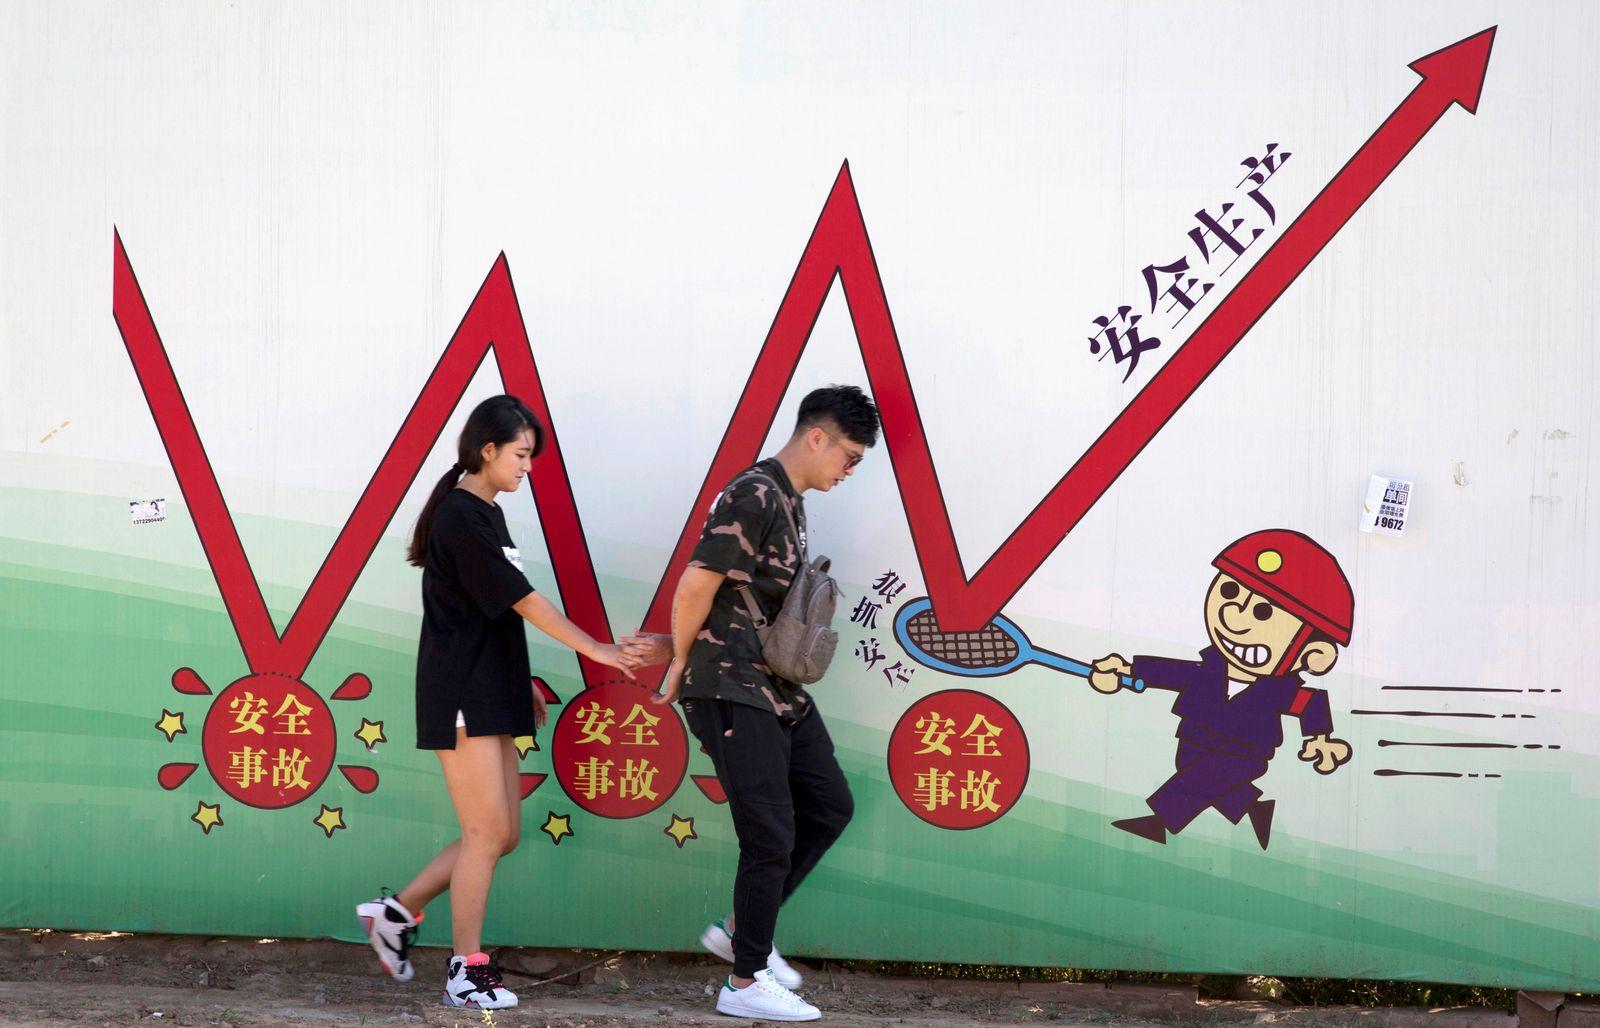 China Legislature Economy